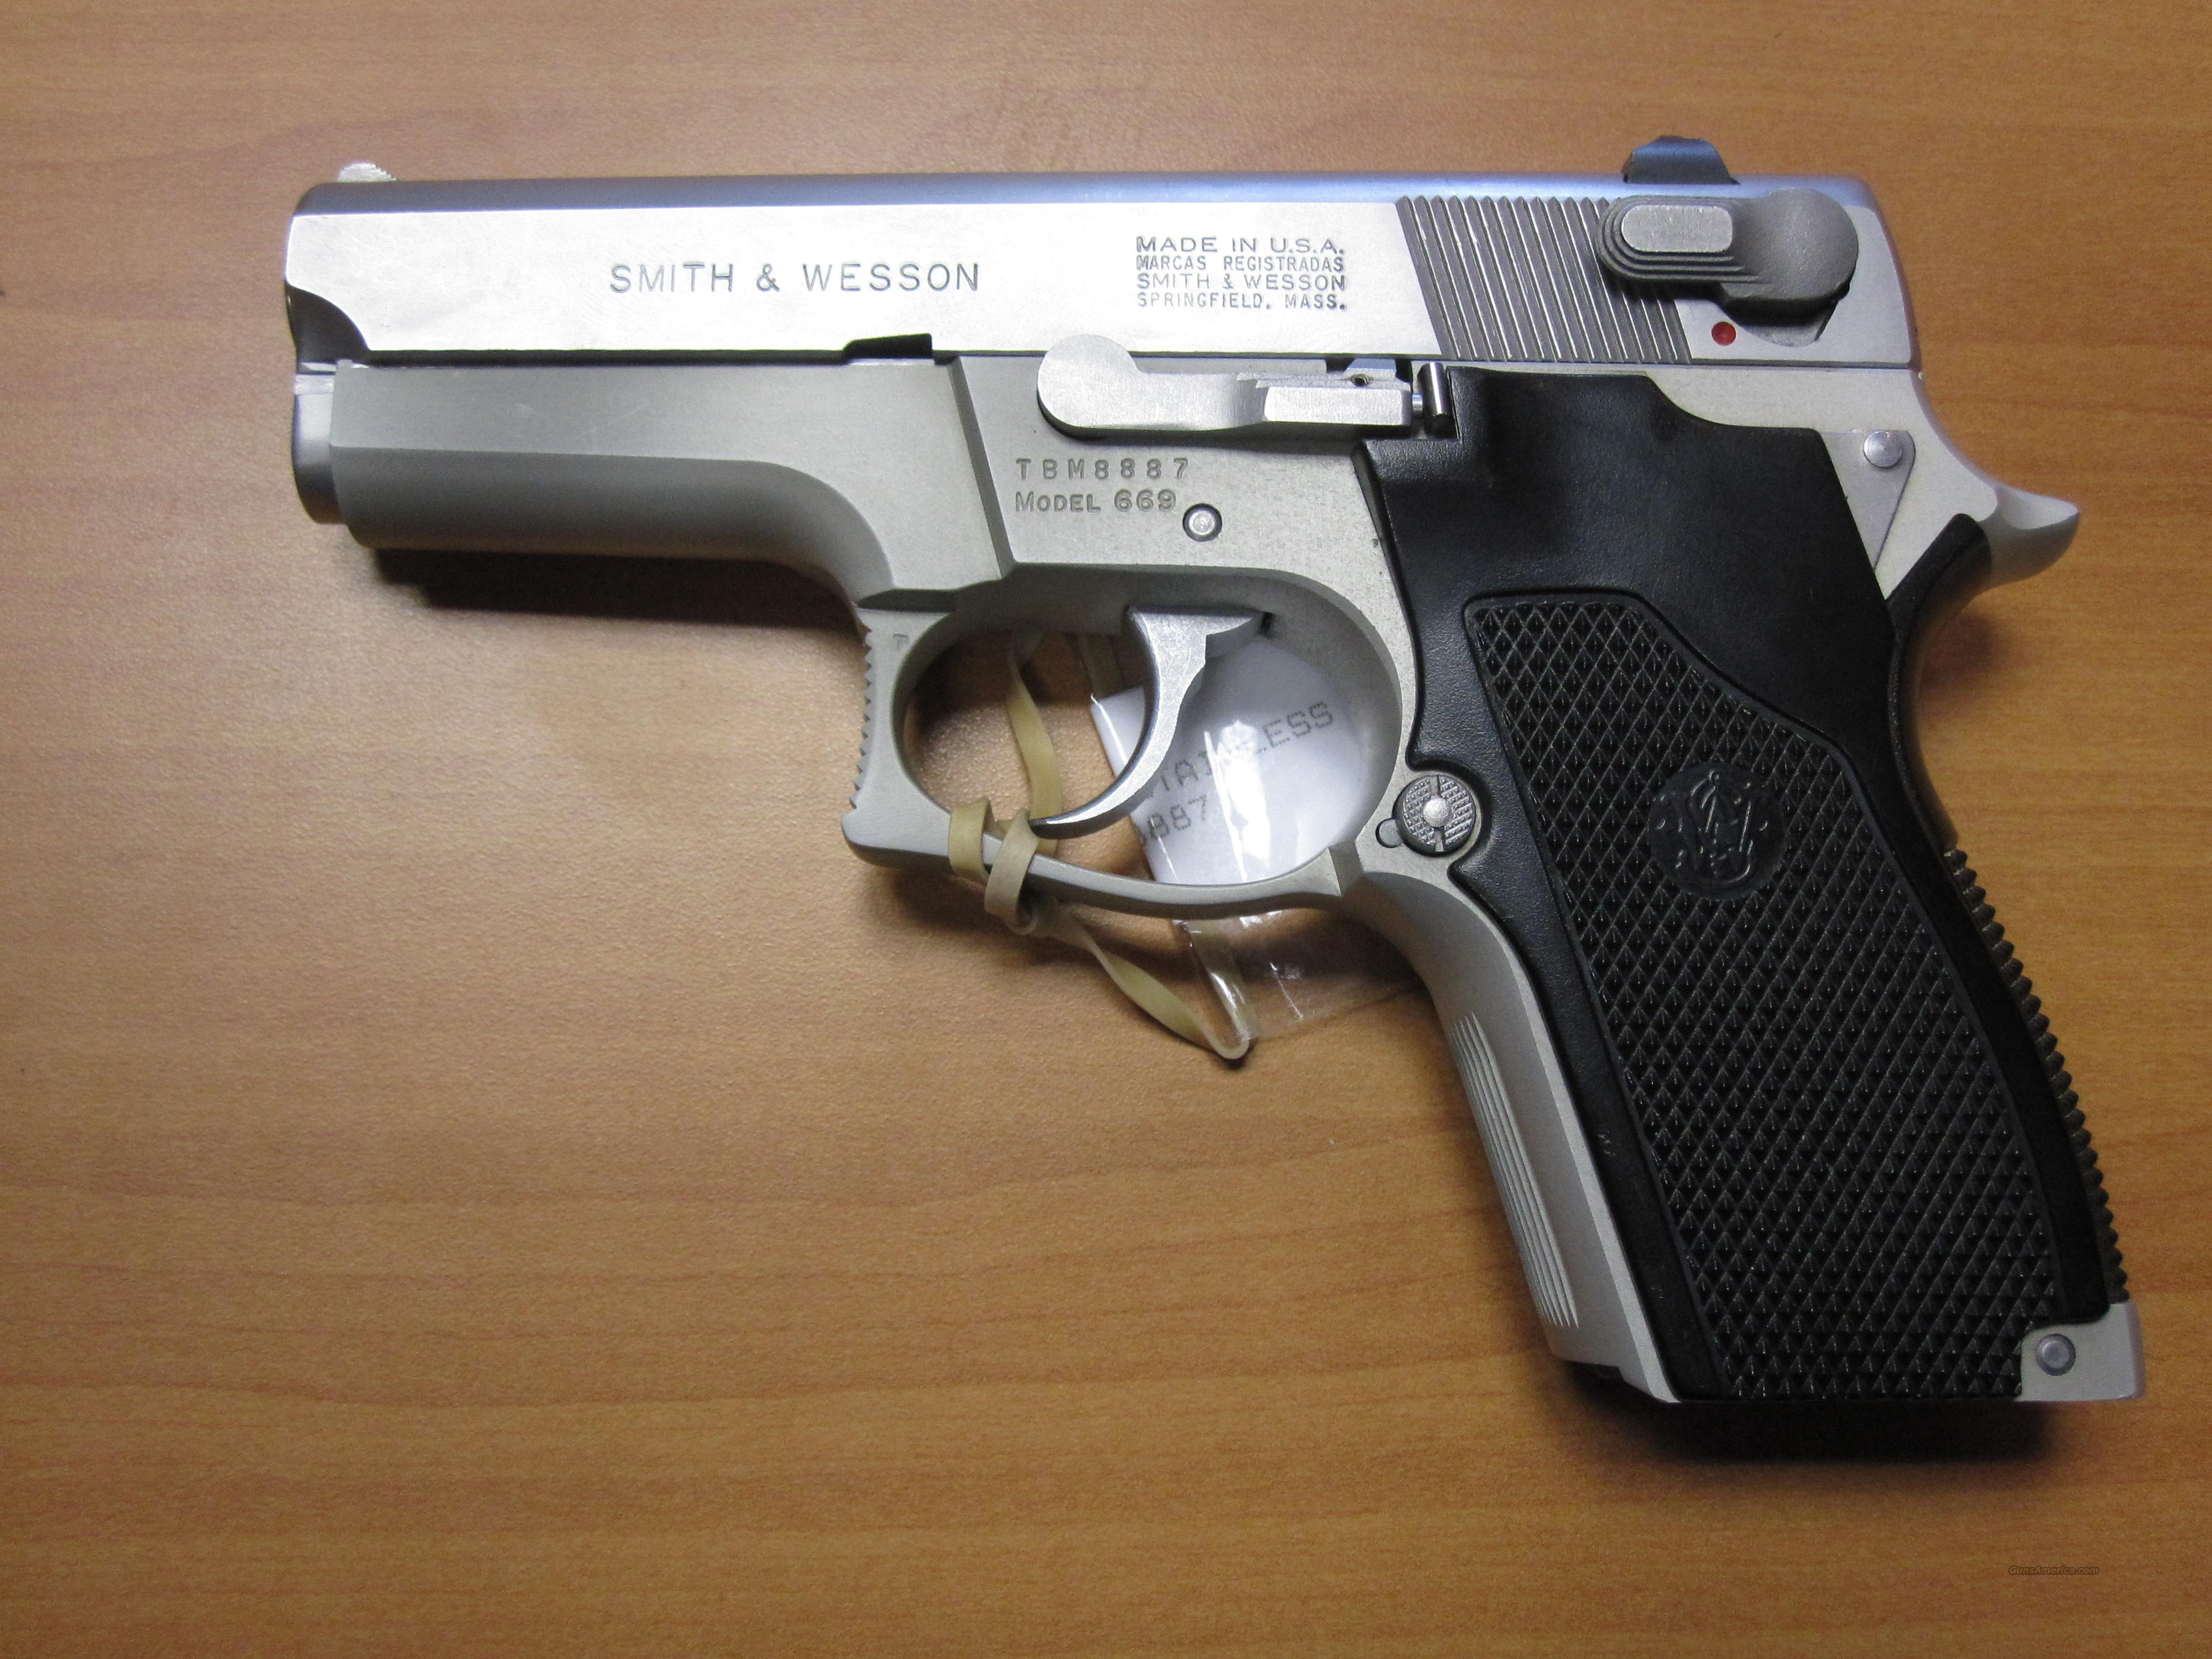 "smith & wesson mod# 669 3.5"" 9mm pistol   Guns > Pistols > Smith & Wesson Pistols - Autos > Alloy Frame"